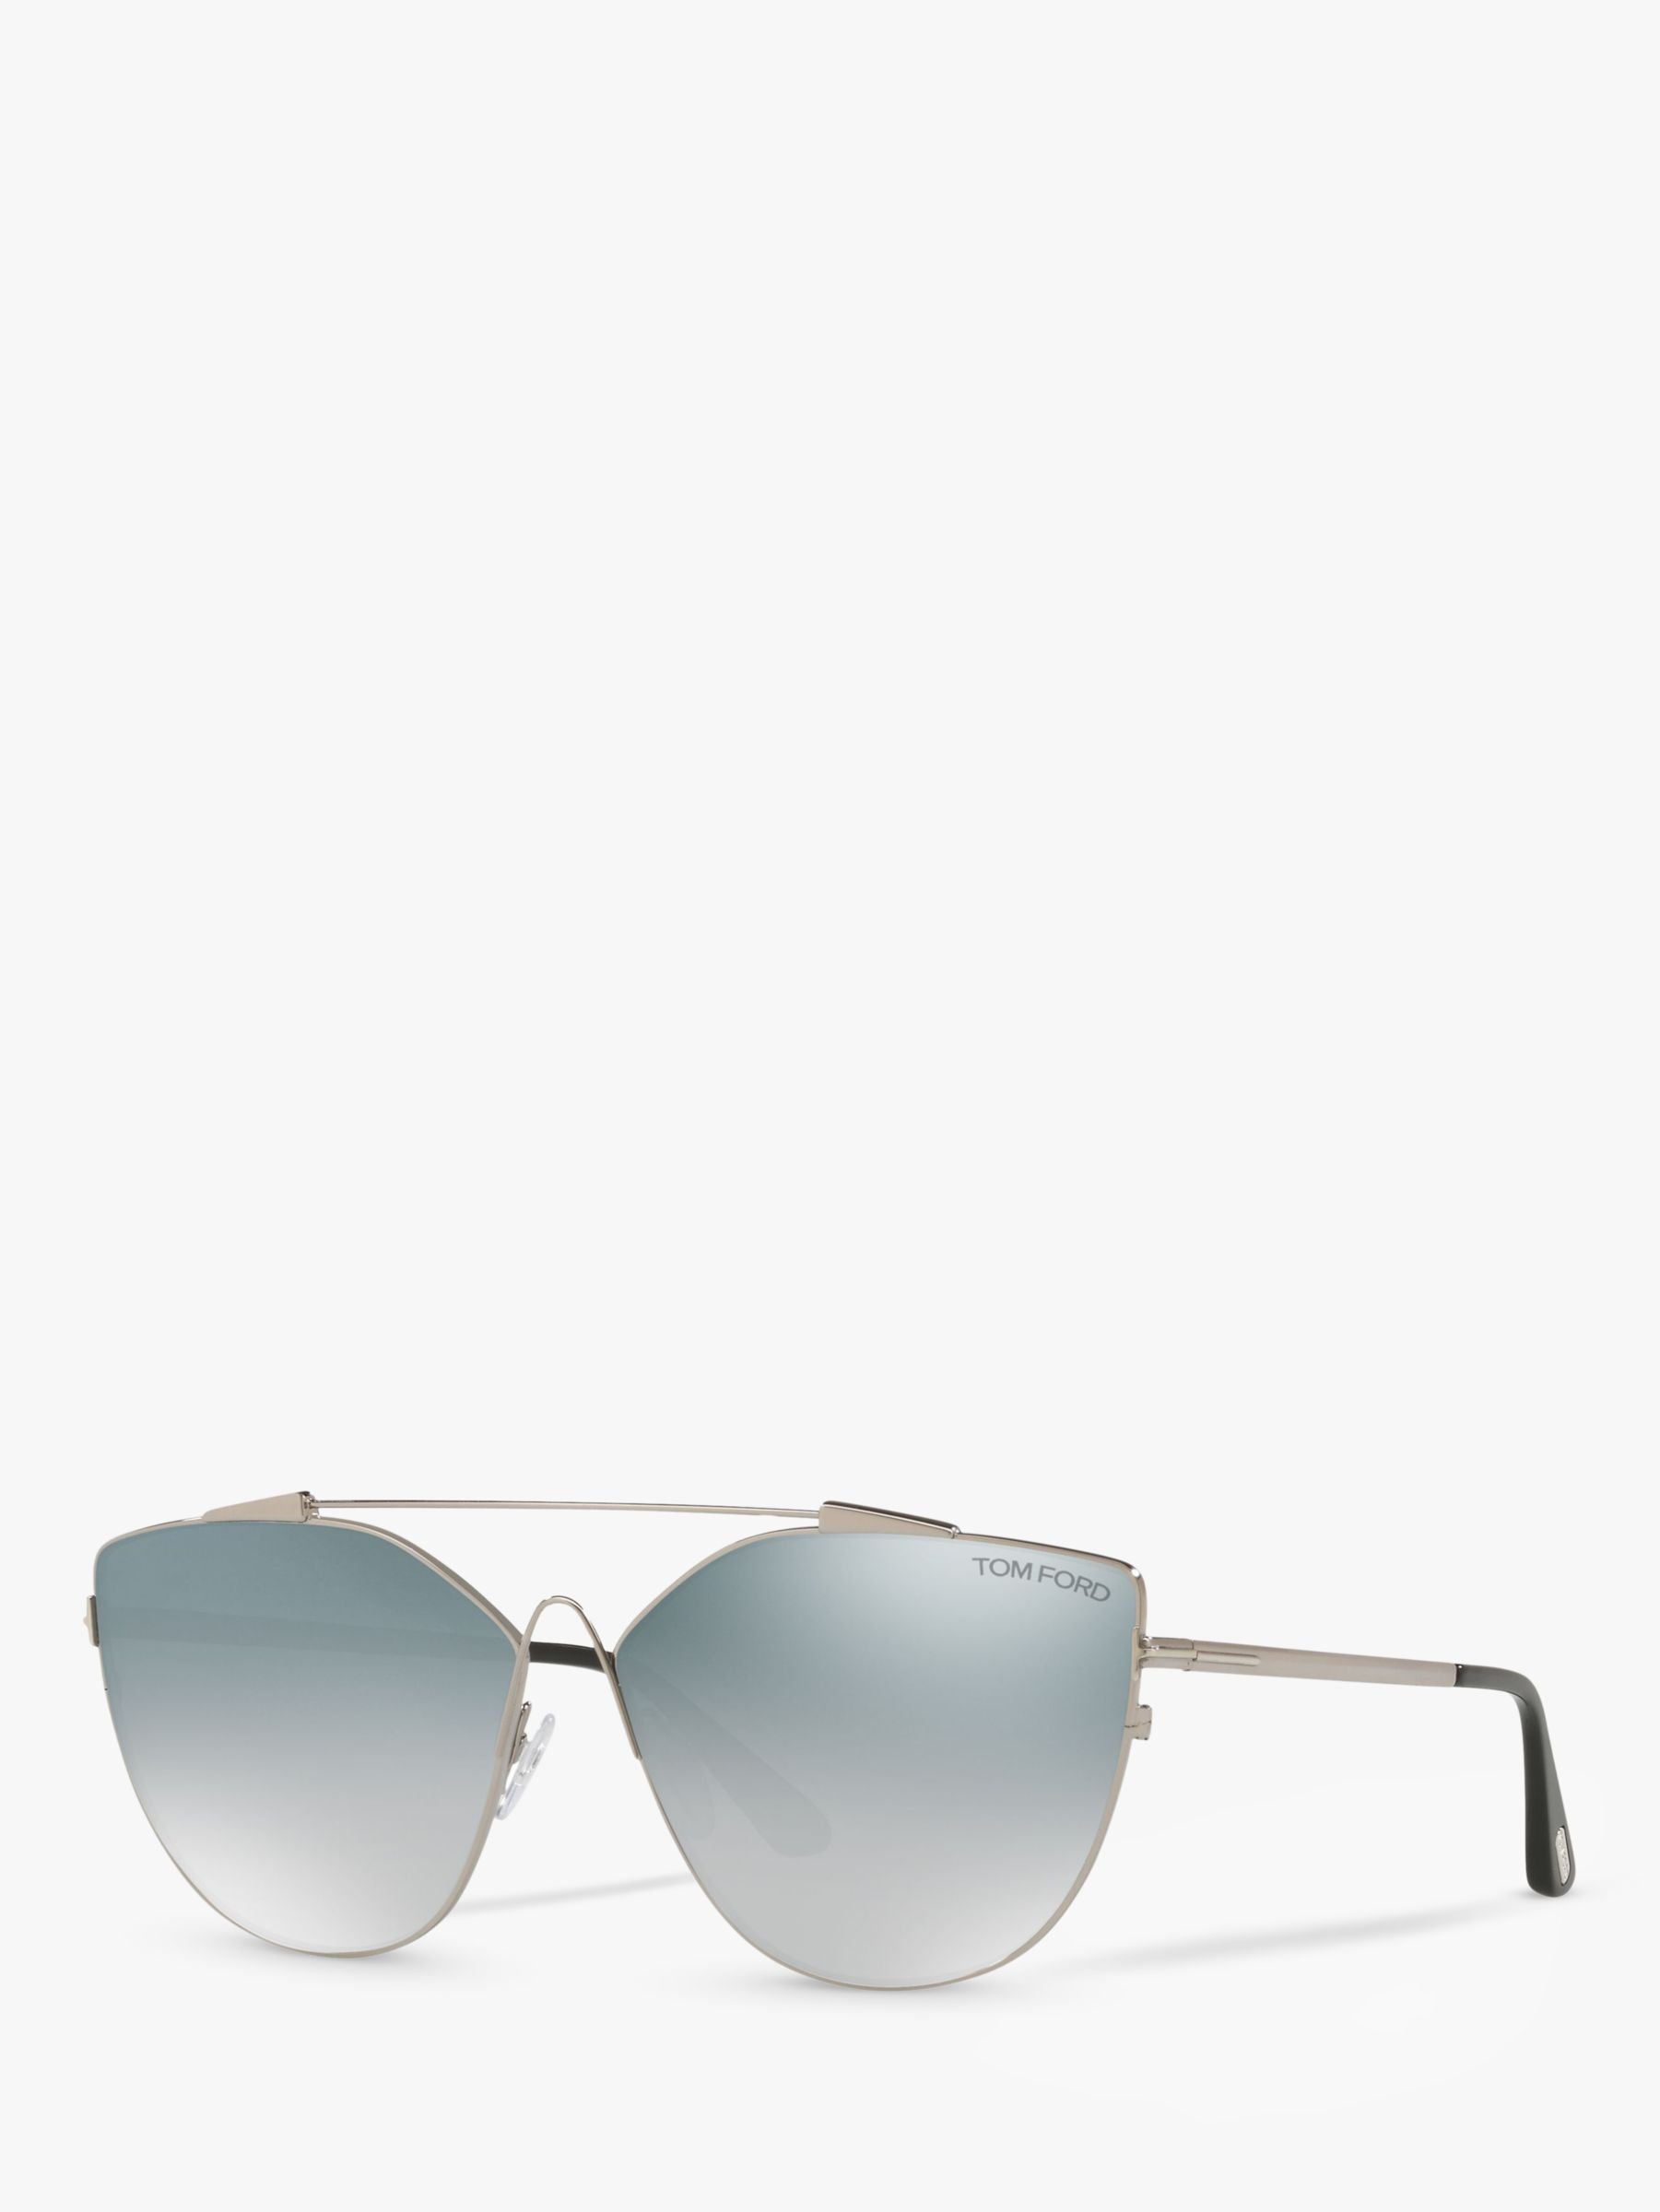 Tom Ford TOM FORD FT0563 Jacquelyn Cat's Eye Sunglasses